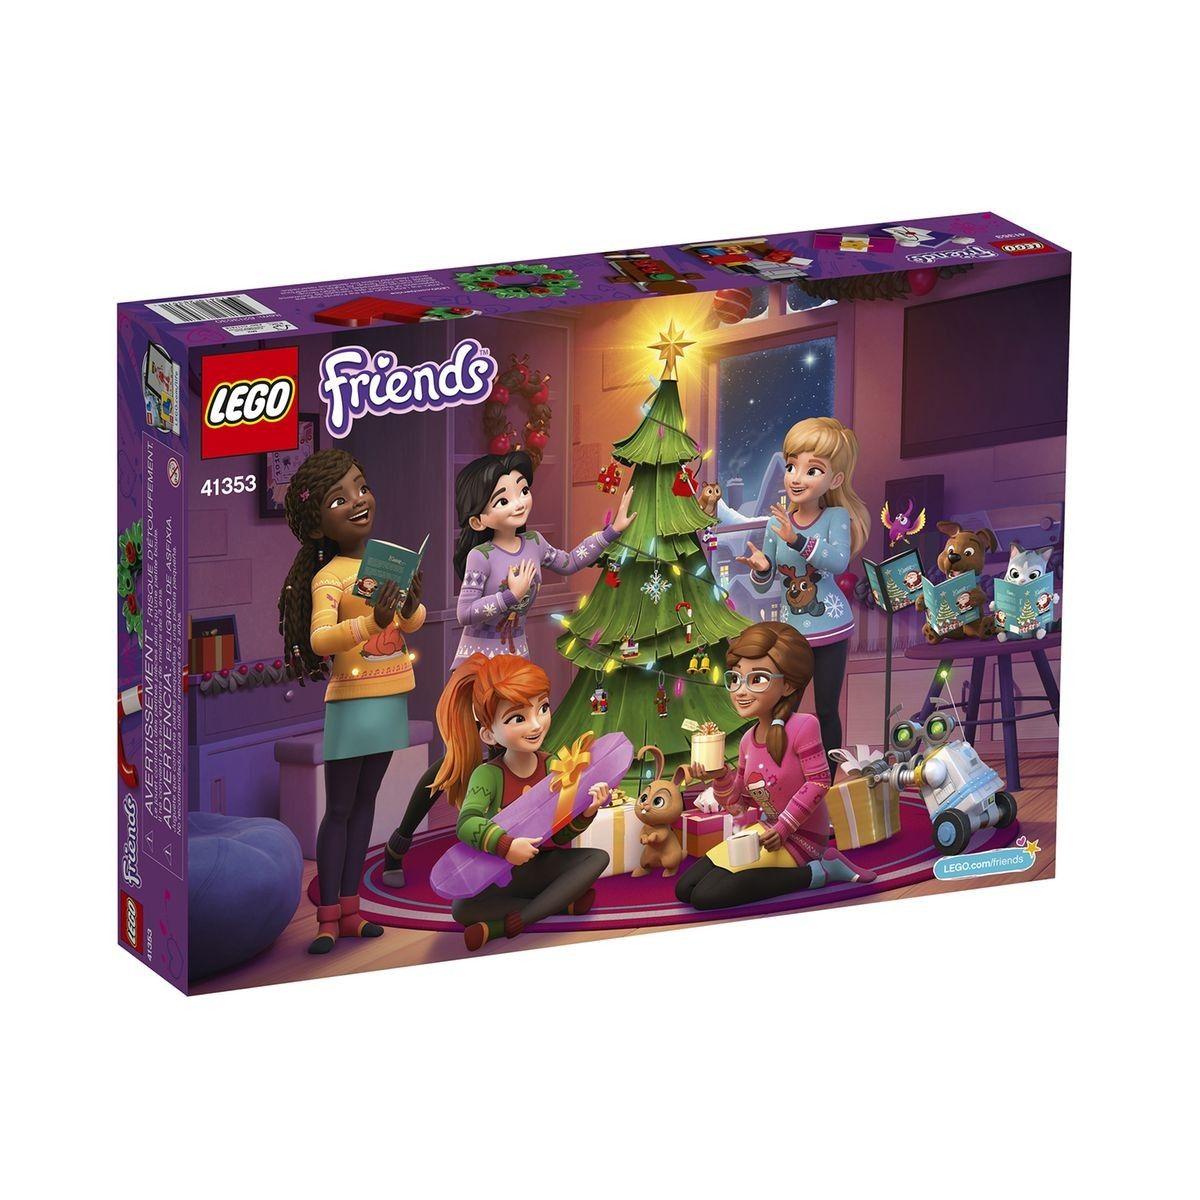 Lego Calendrier.Le Calendrier De L Avent Lego Friends 41353 Taille